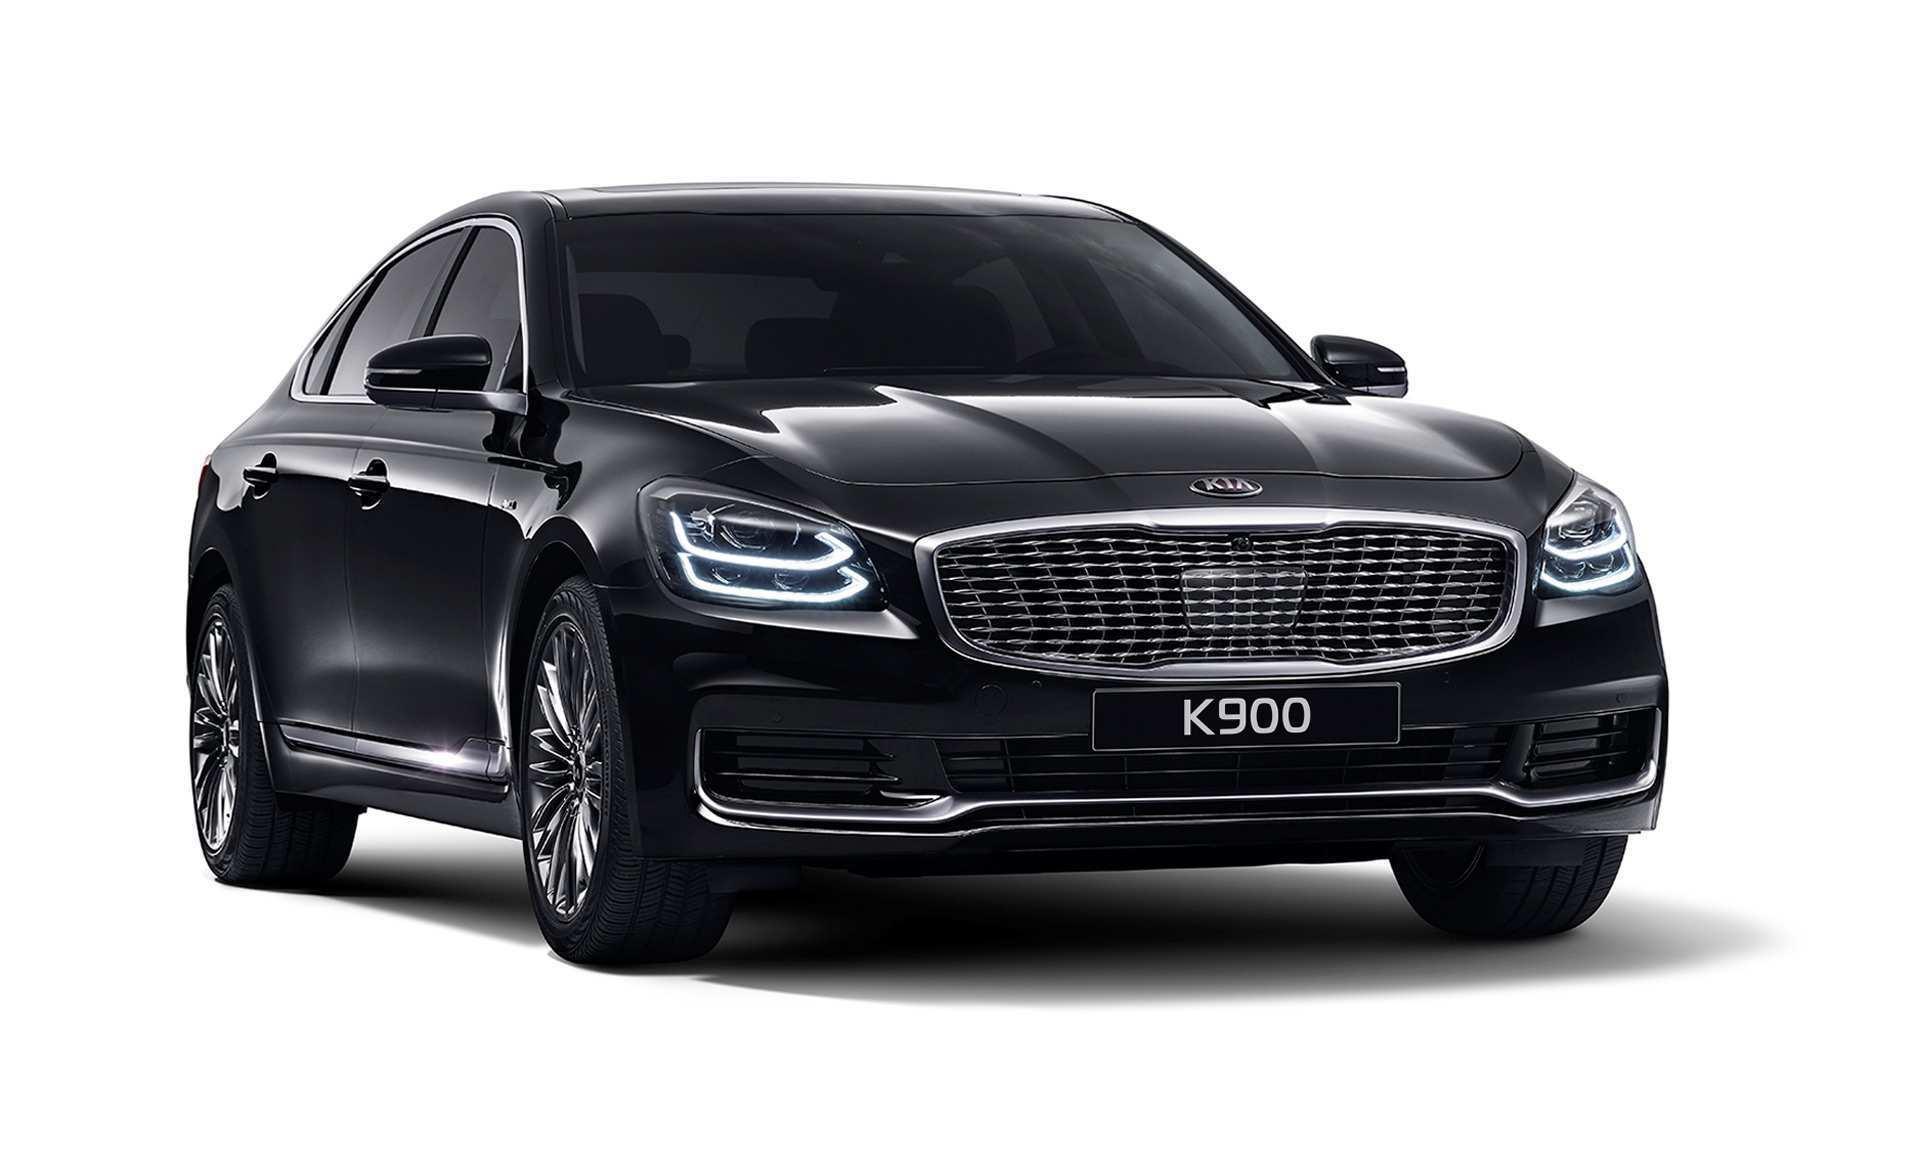 70 The K900 Kia 2019 Ratings by K900 Kia 2019